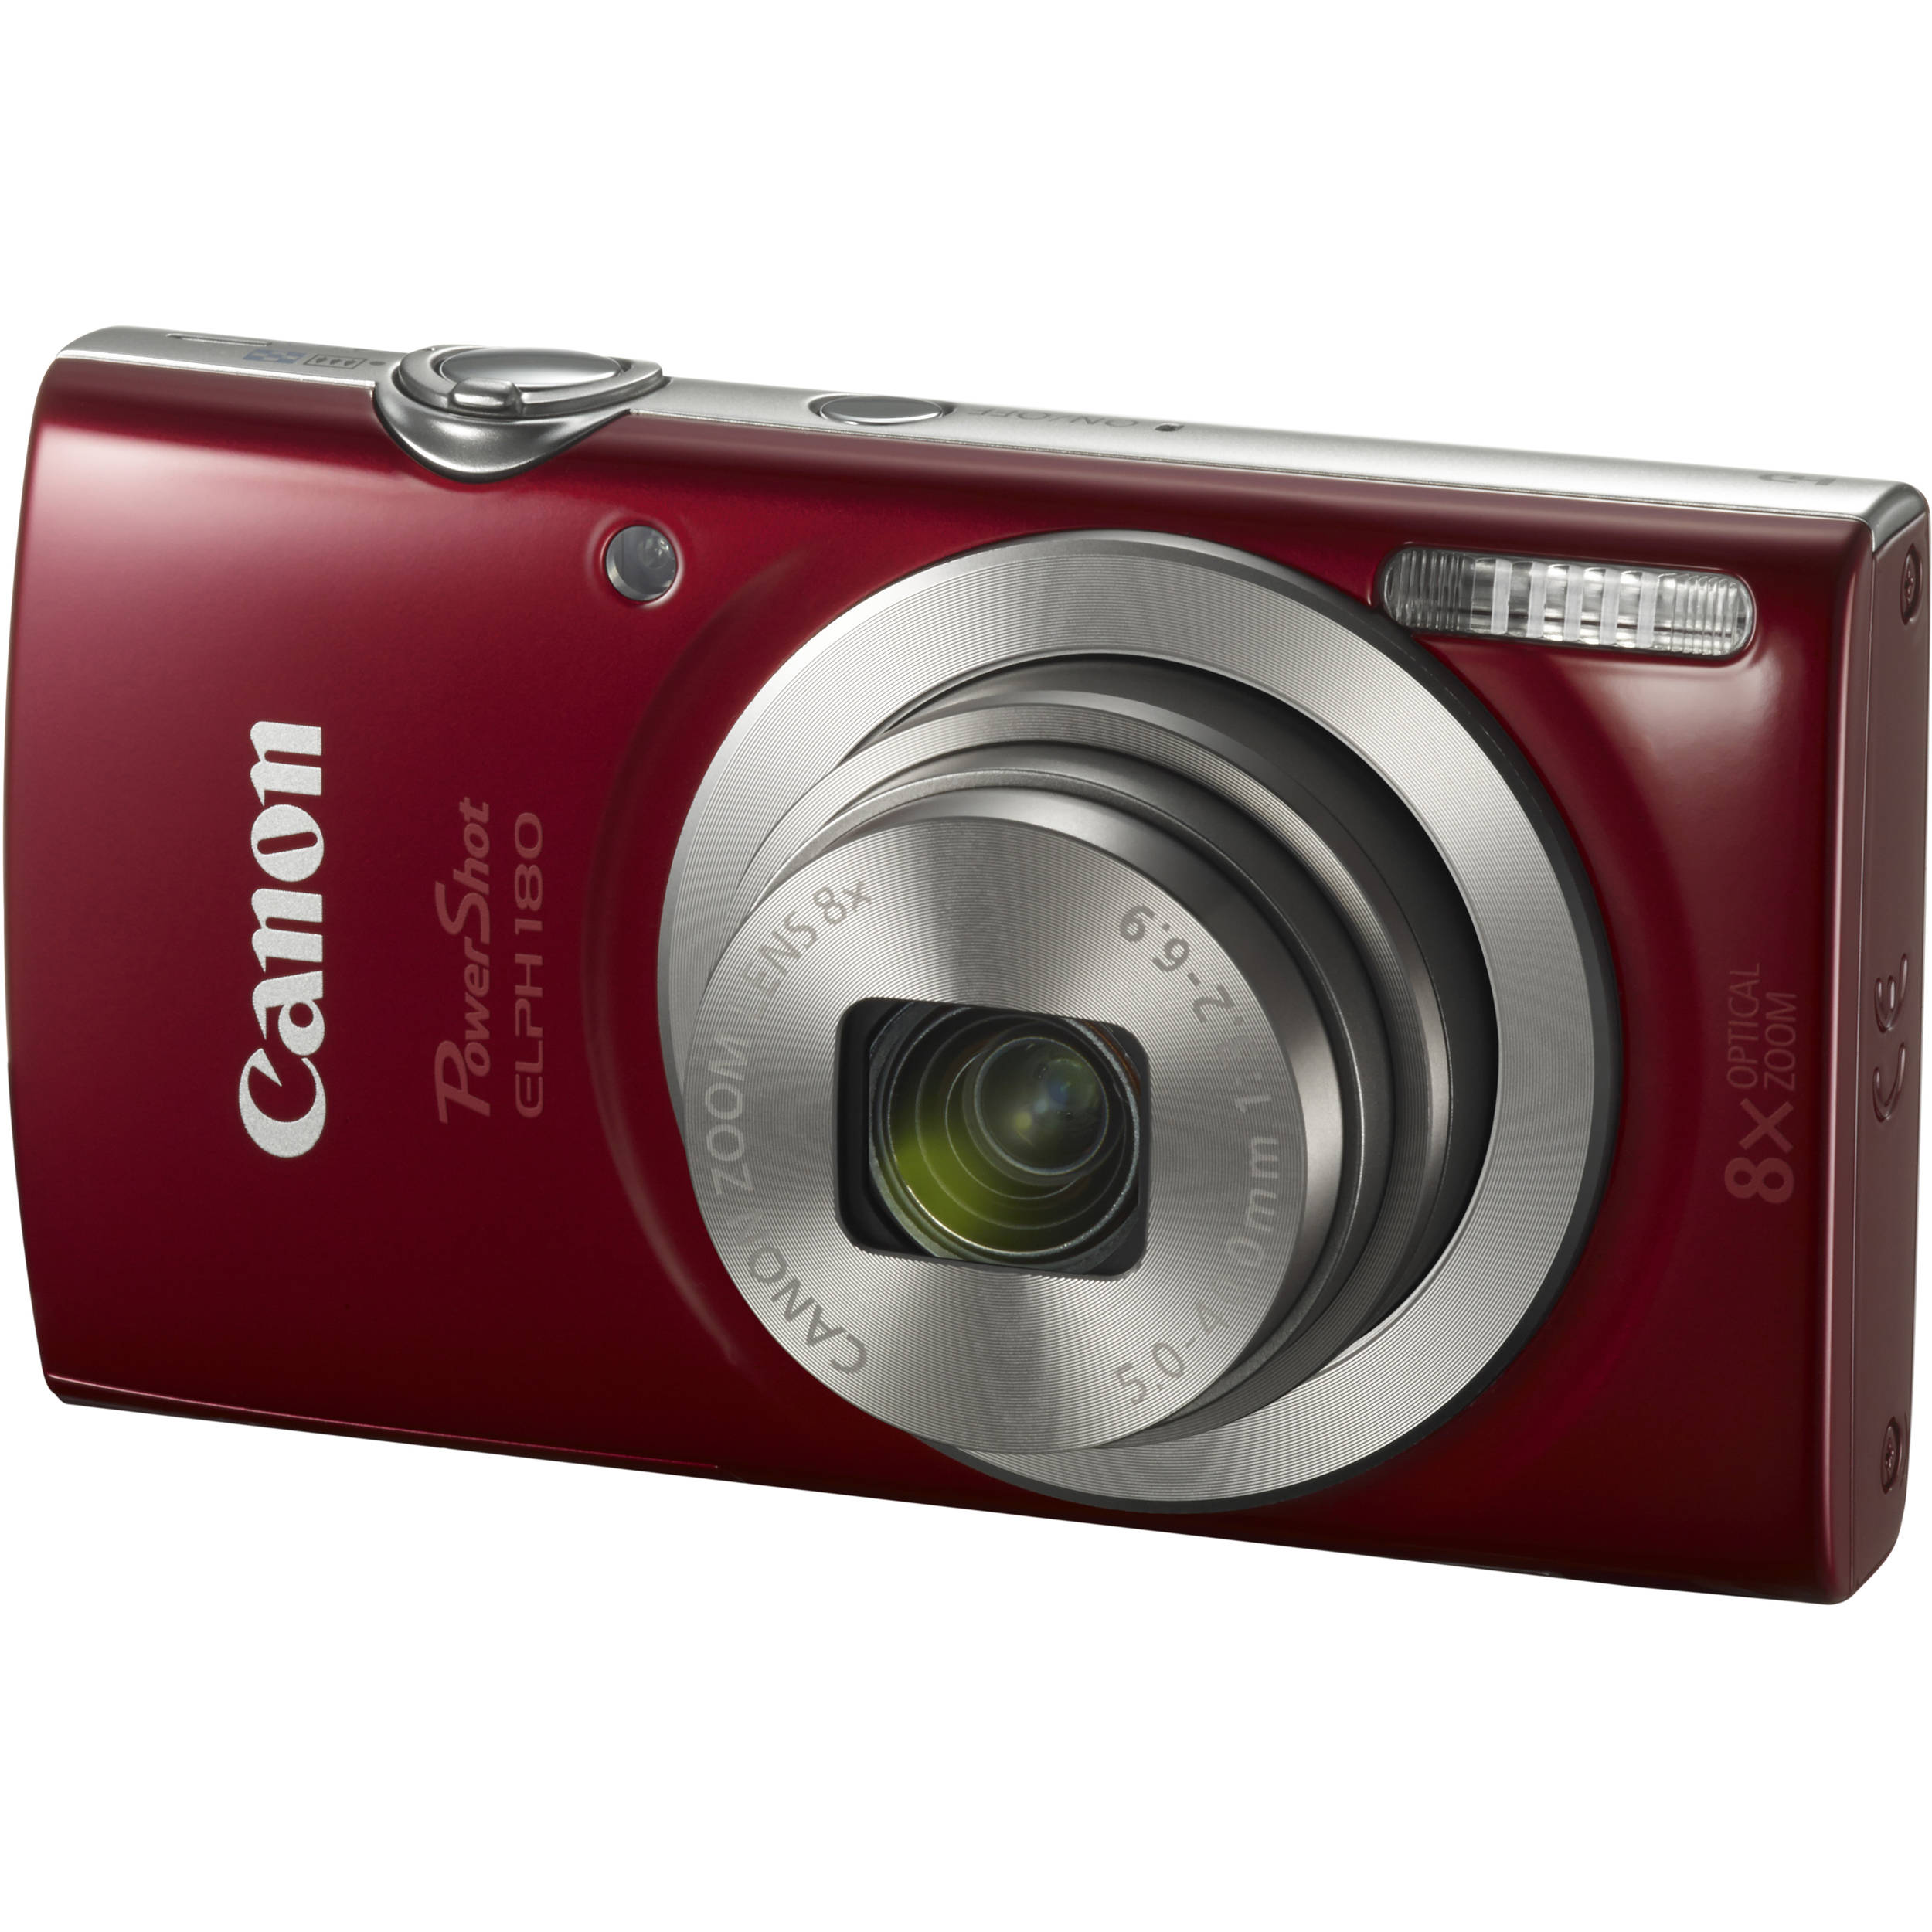 canon powershot elph 180 digital camera red 1096c001 b h photo rh bhphotovideo com canon elph aps manual canon elph 170 manual